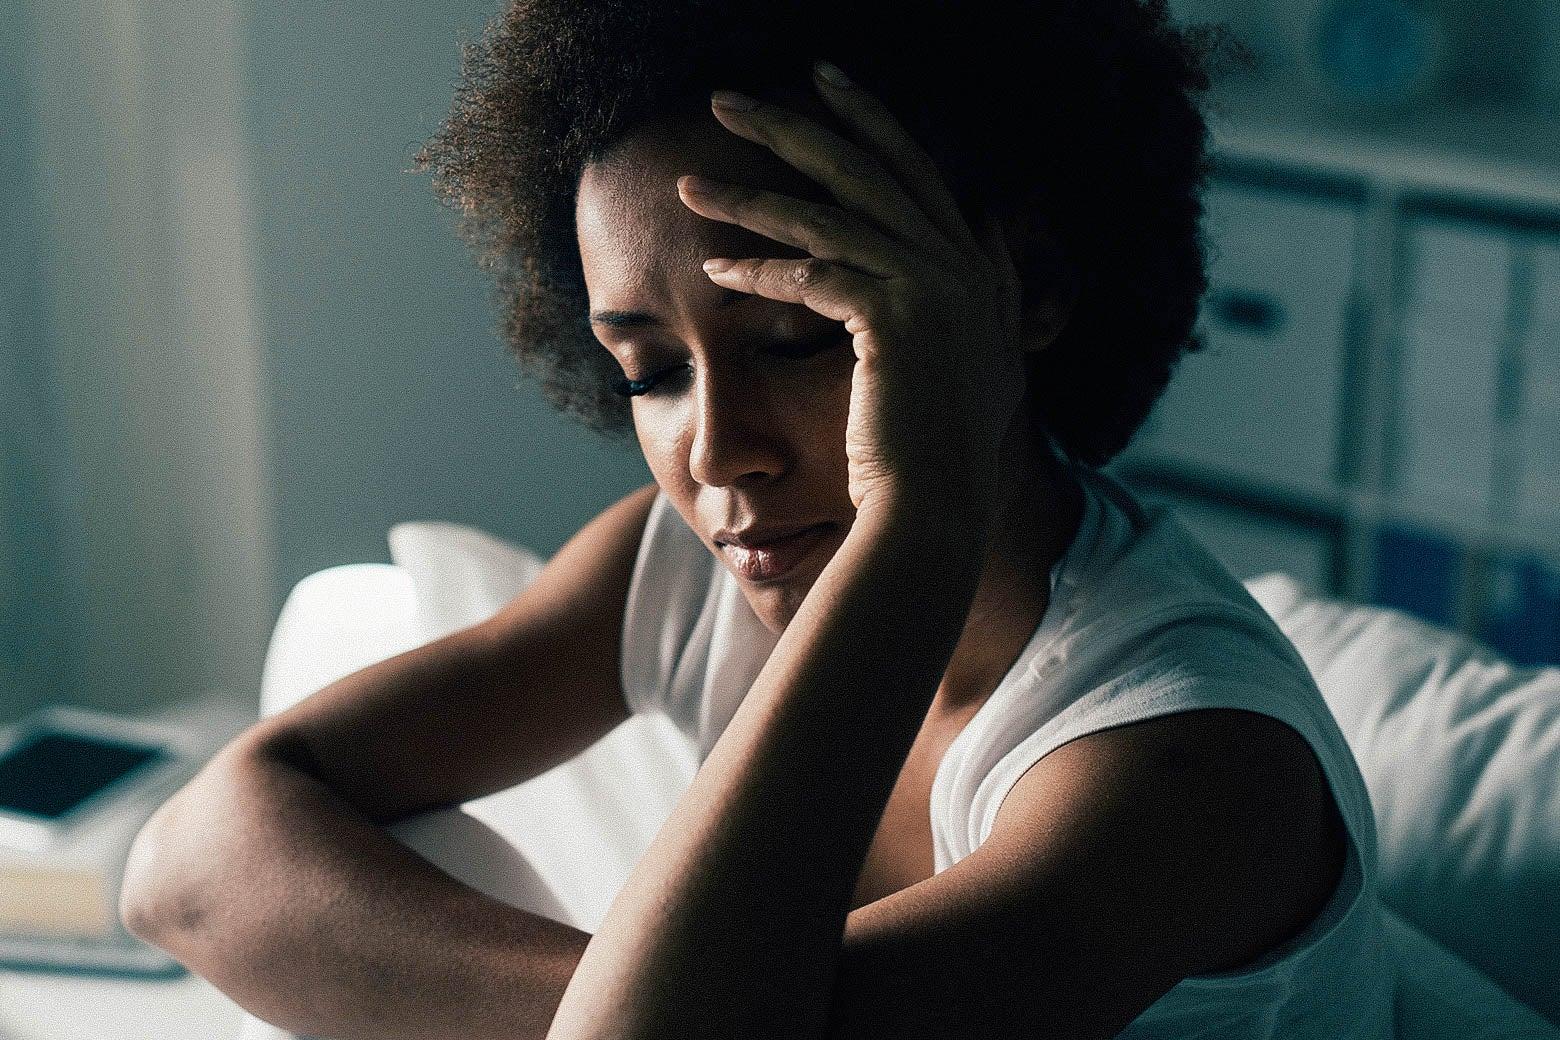 A woman having  trouble sleeping.